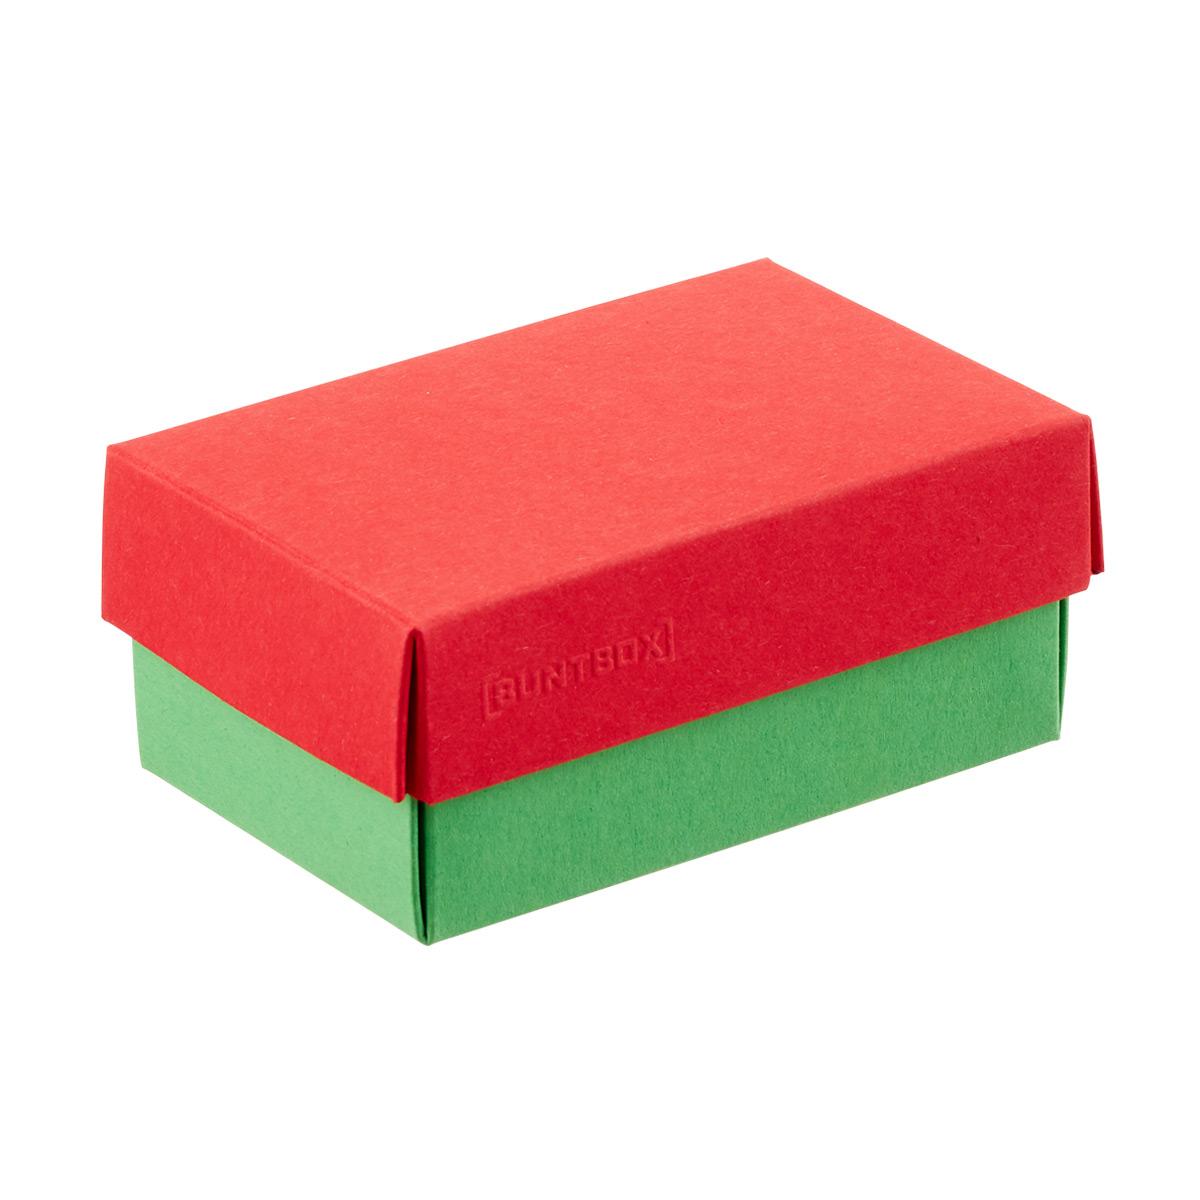 2-pc Gift Boxes Christmas